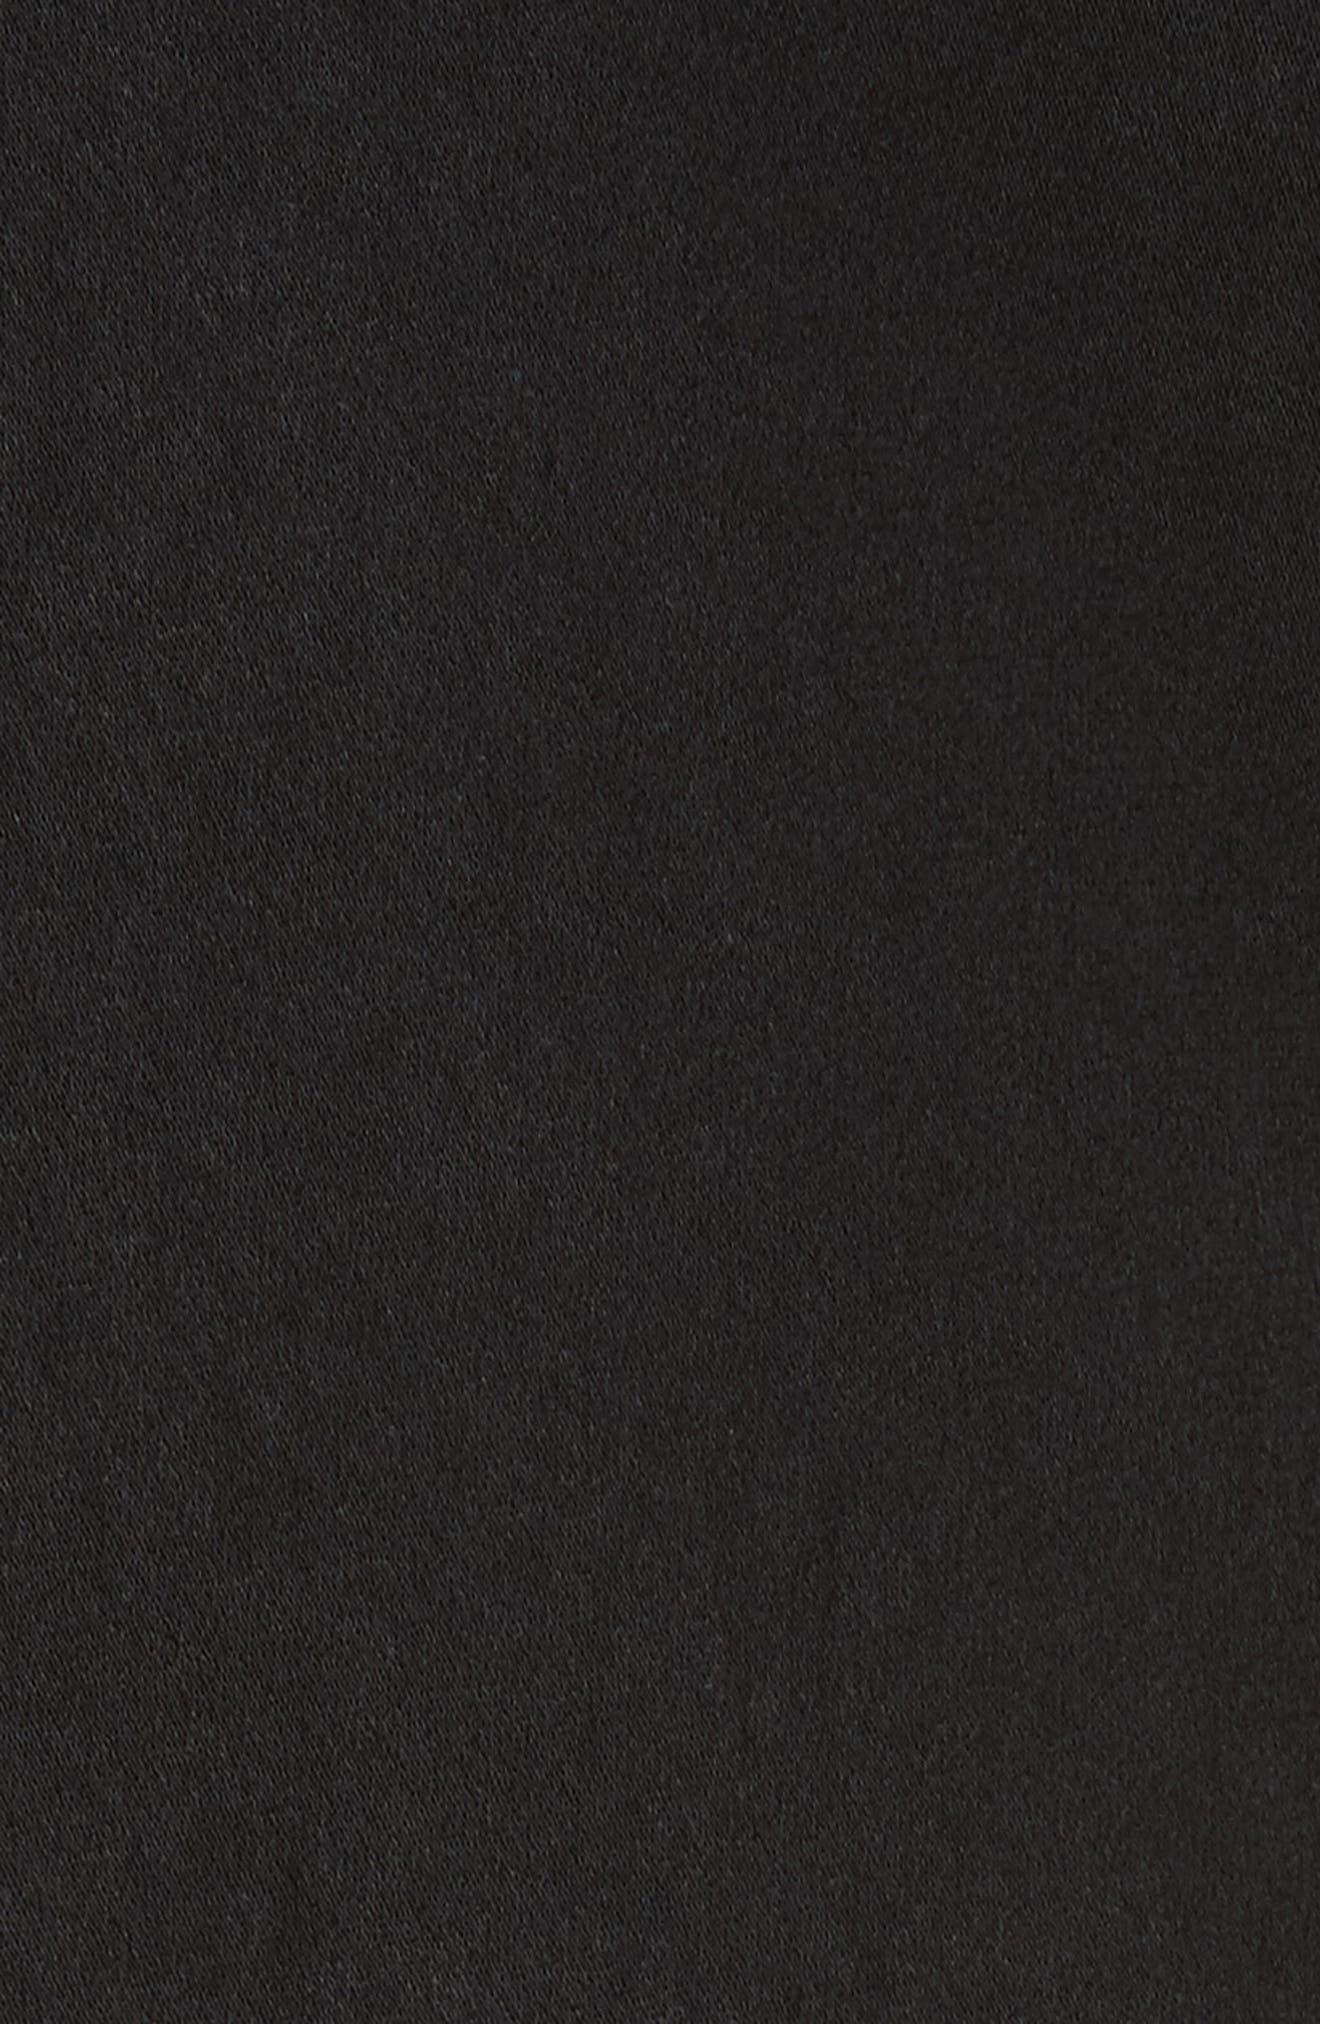 Fandango Fringed Slipdress,                             Alternate thumbnail 5, color,                             Black